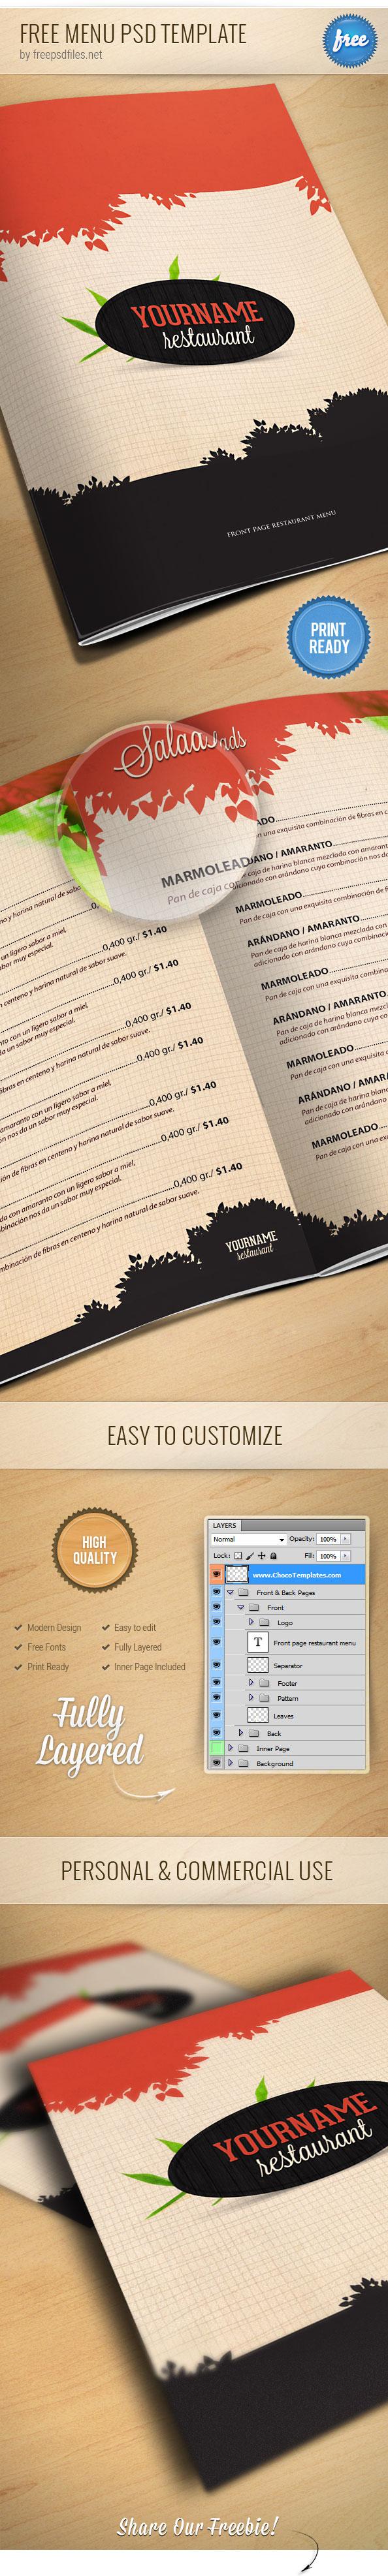 Restaurant Menu PSD Template Preview